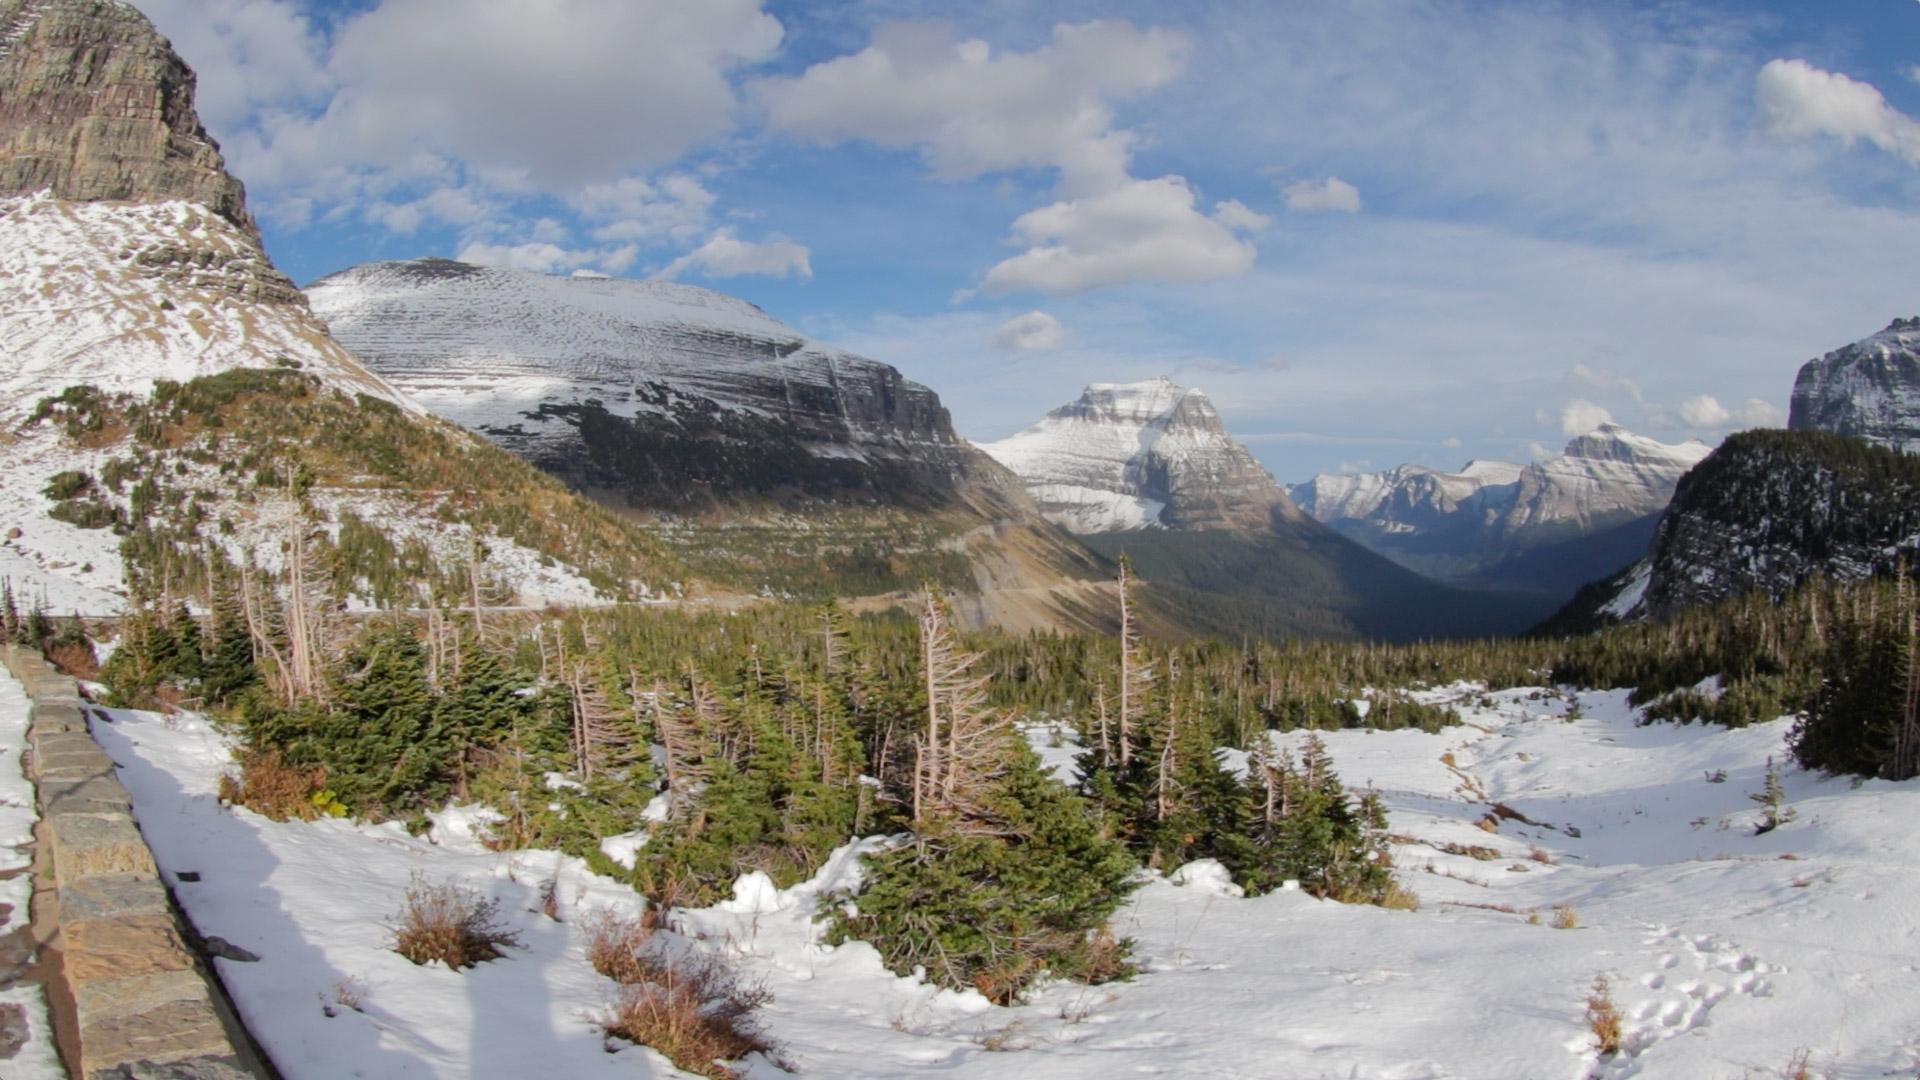 """Glacier"" with the EOS SL2 + Tokina AT-X DX 10-17mm f/3.5-4.5 Fisheye, 1080P24; clique para ver maior."